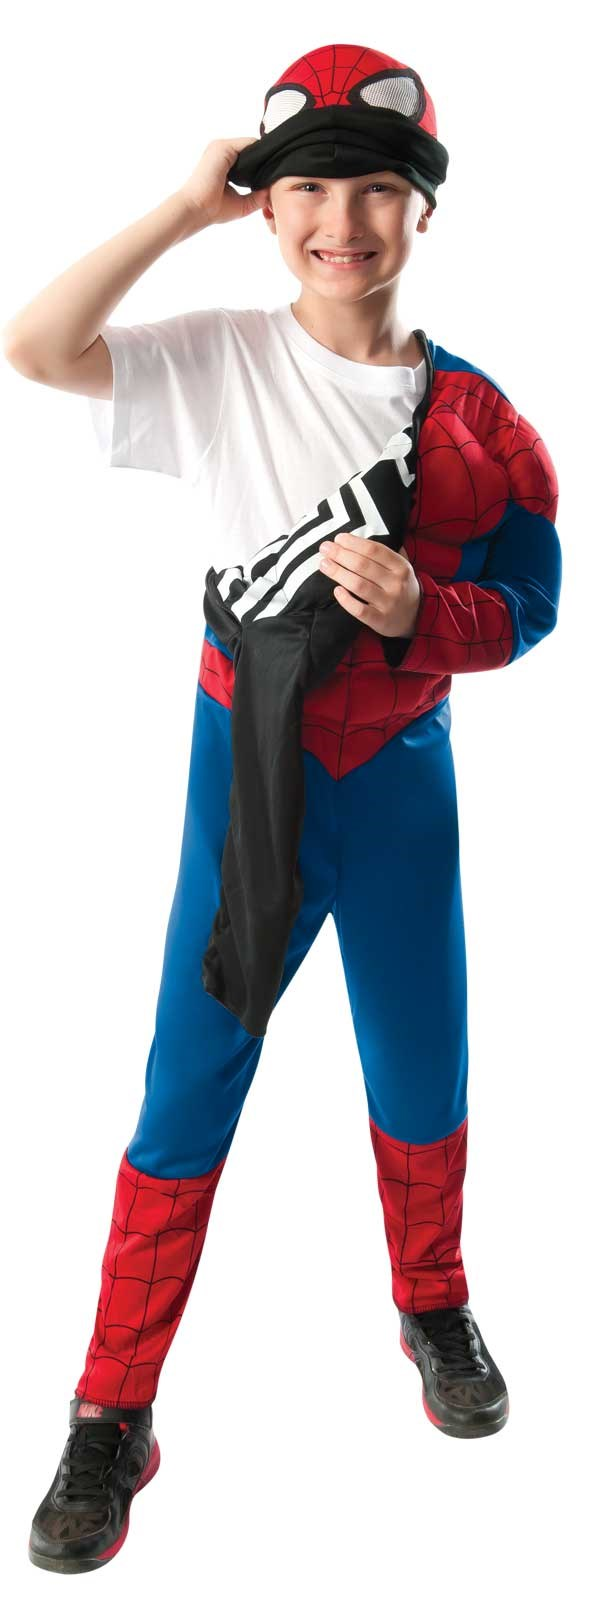 Ultimate Spider-Man Reversible Kids Costume   BuyCostumes.com